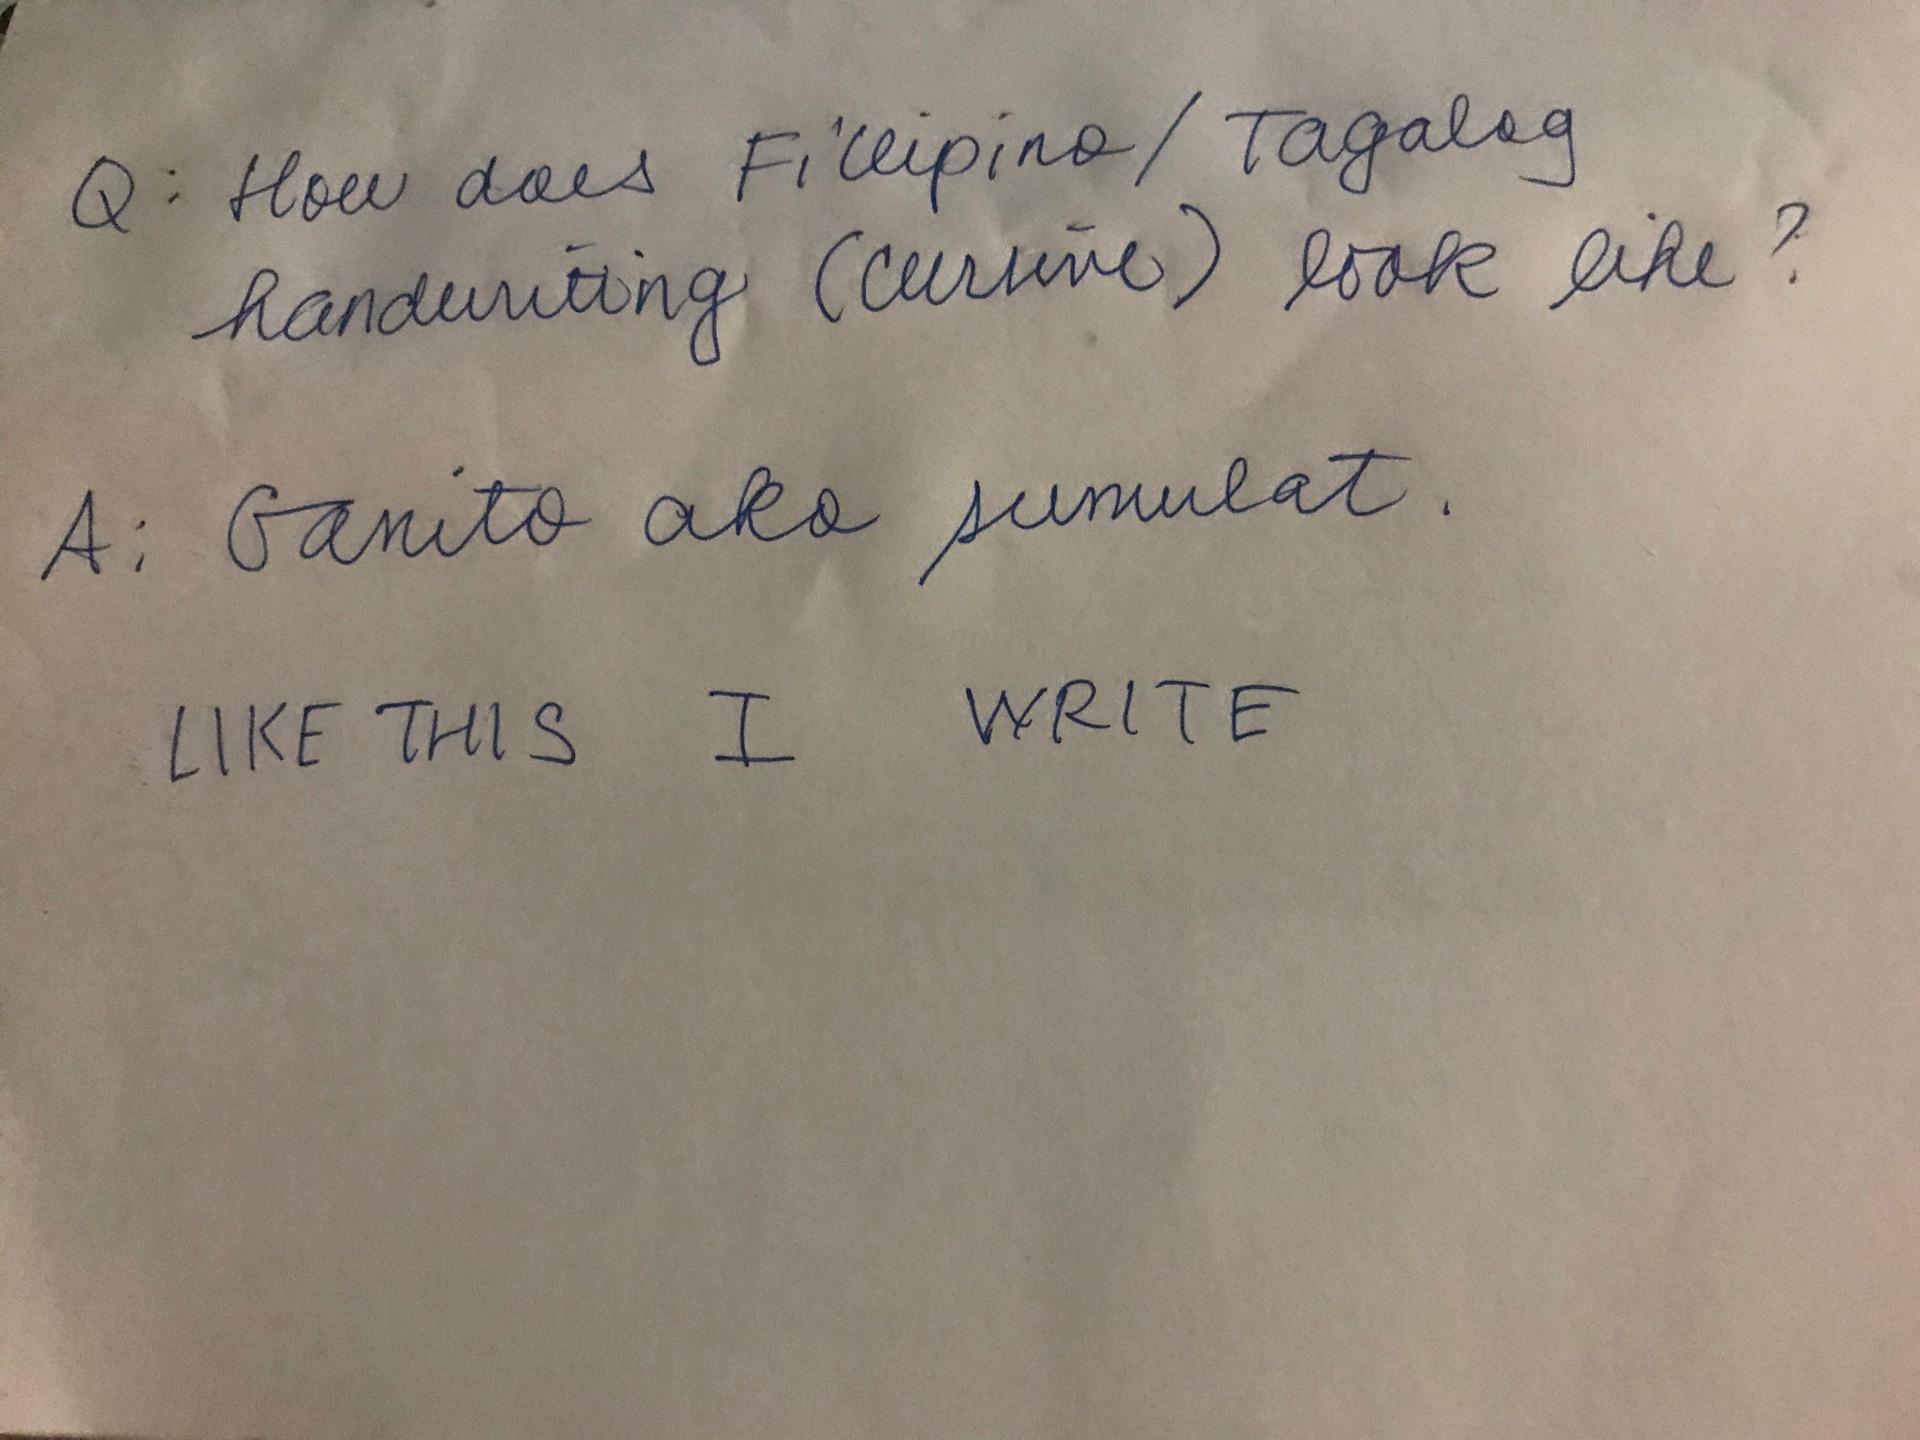 How Does Filipino Tagalog Handwriting Cursive Look Like Quora